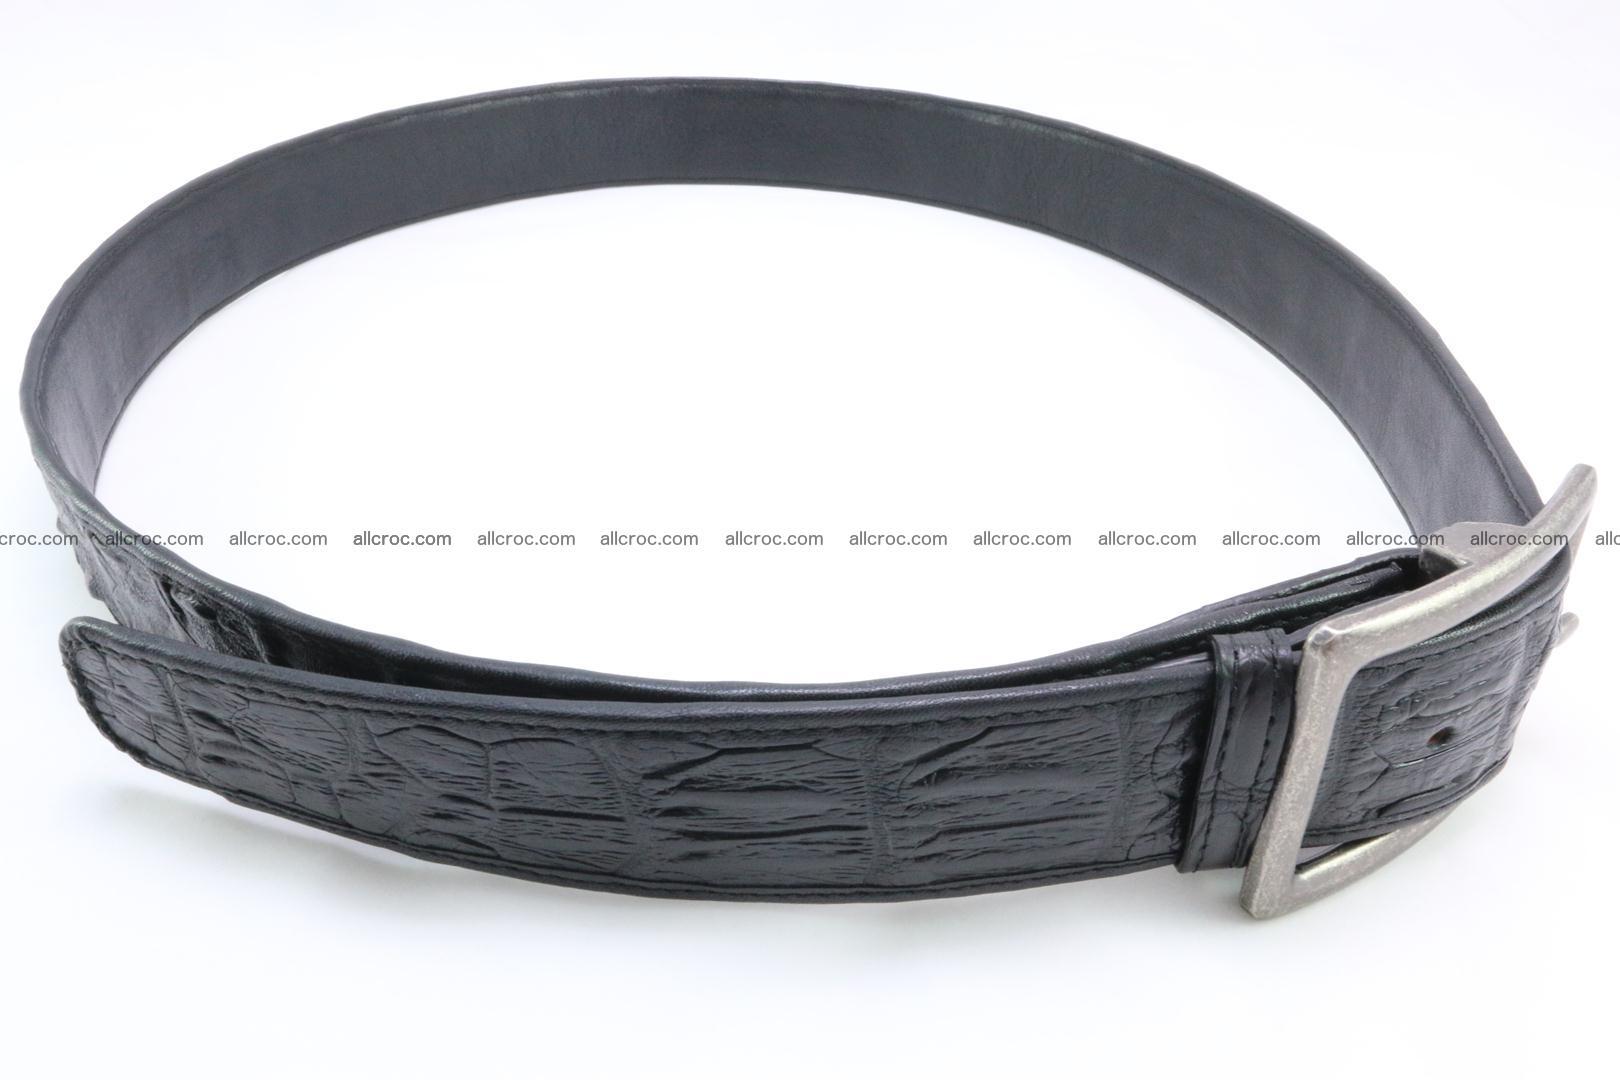 Genuine crocodile leather hornback belt 077 Foto 2